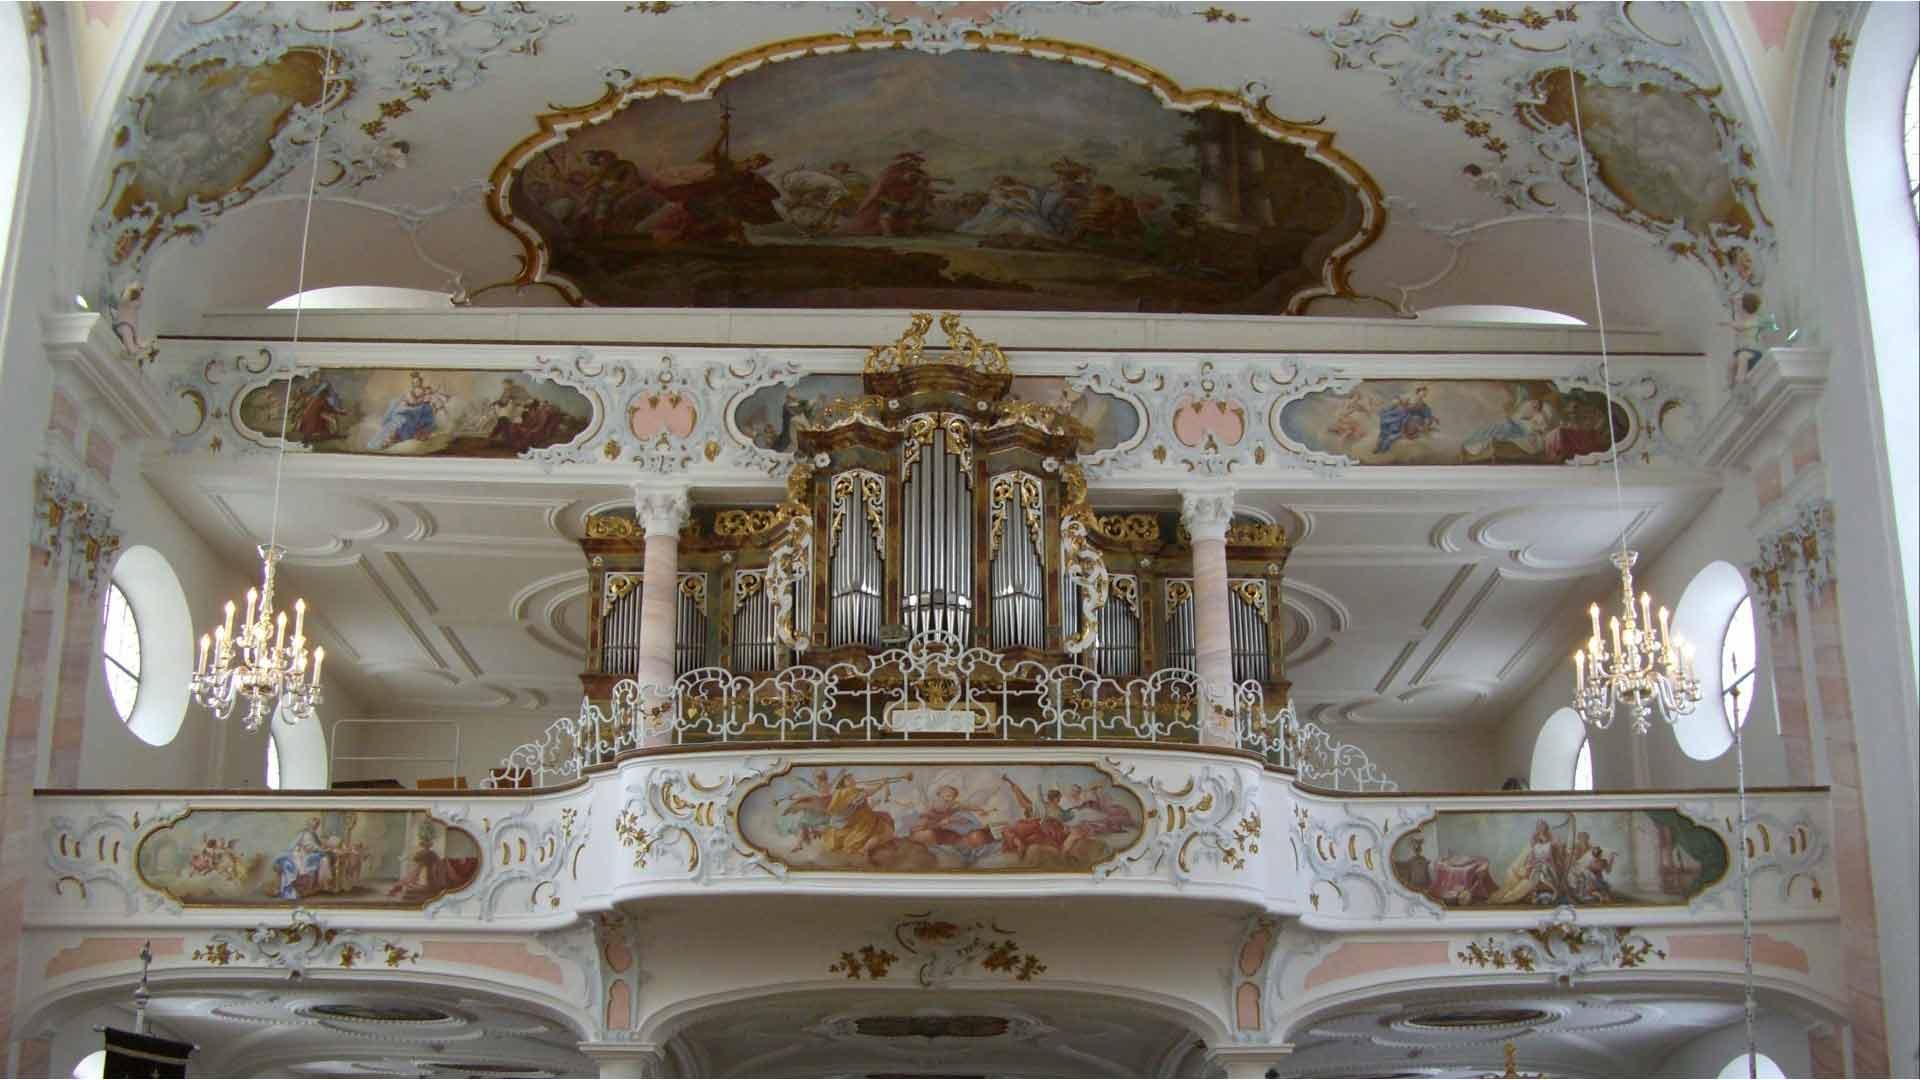 De geweldige rococo parochiekerk in Seeg.